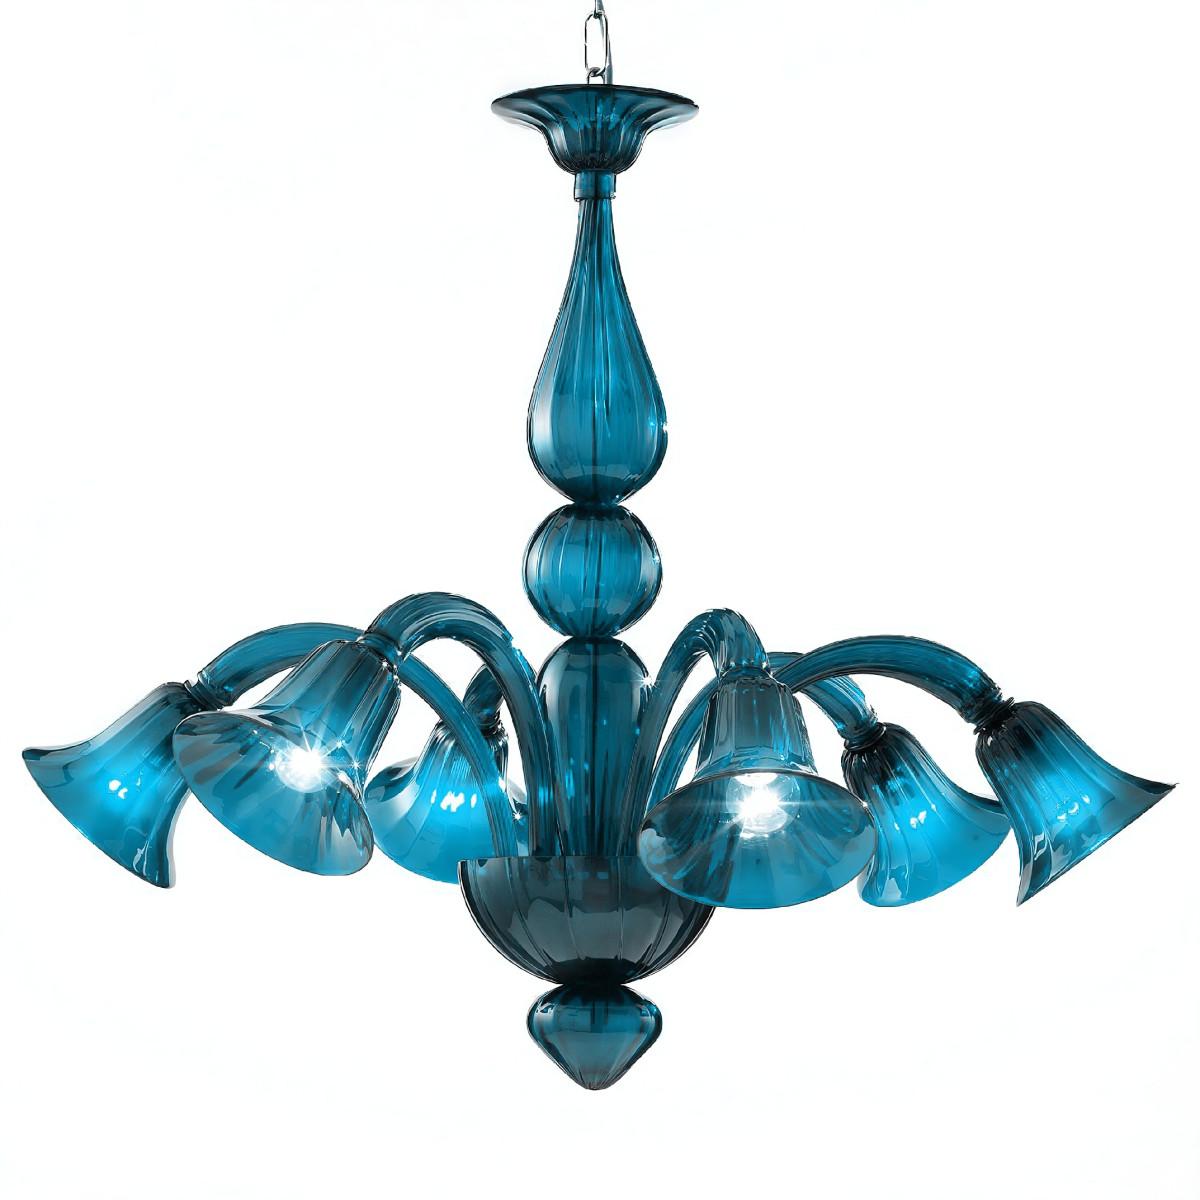 Serenissima 6 flammig Murano Kronleuchter - Aquamarin farbe